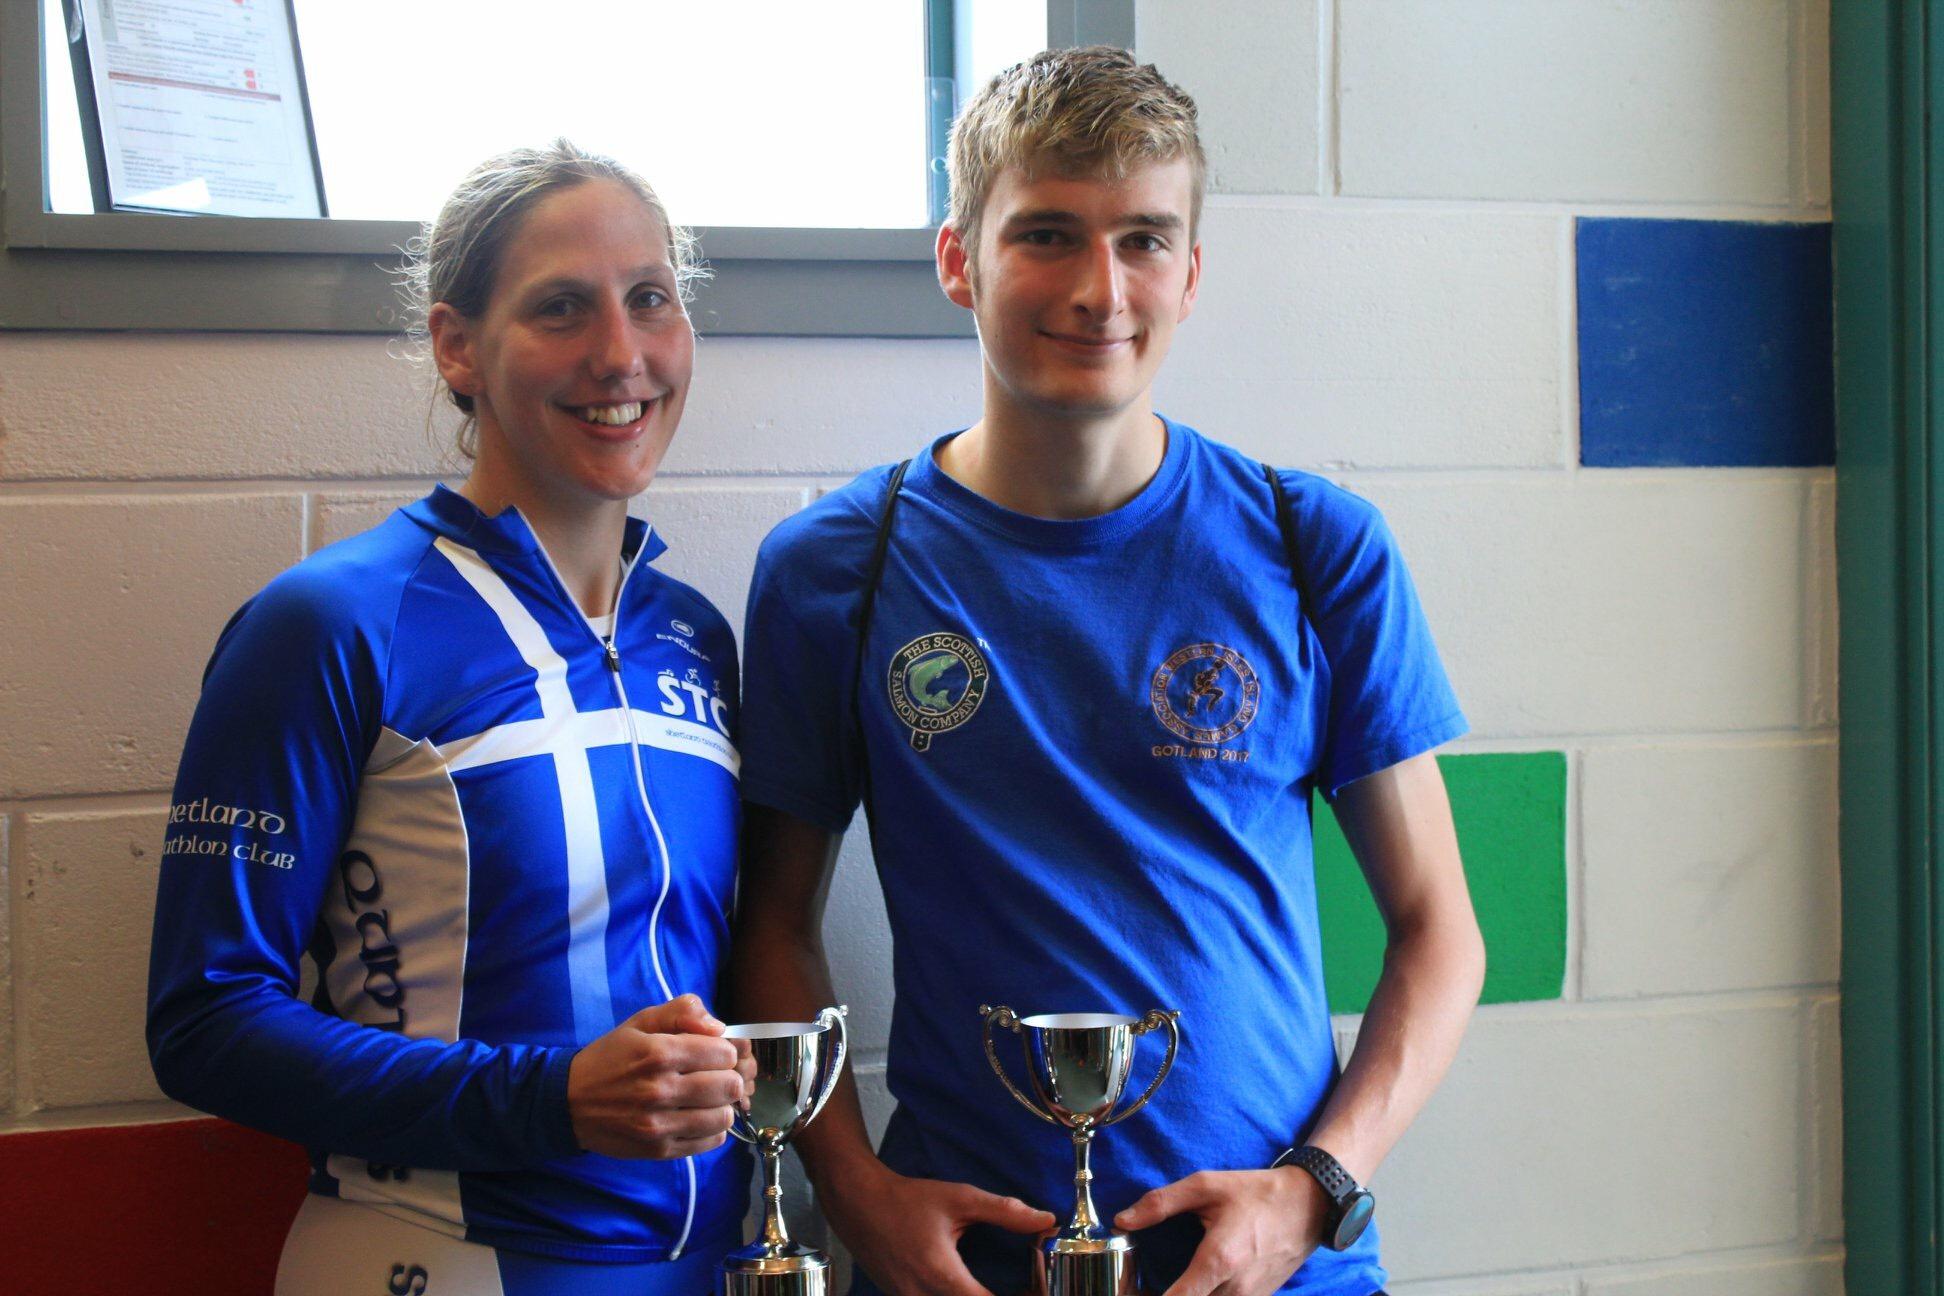 Stromness sprint triathlon winners Lyndsey Henderson and Paul Kerr